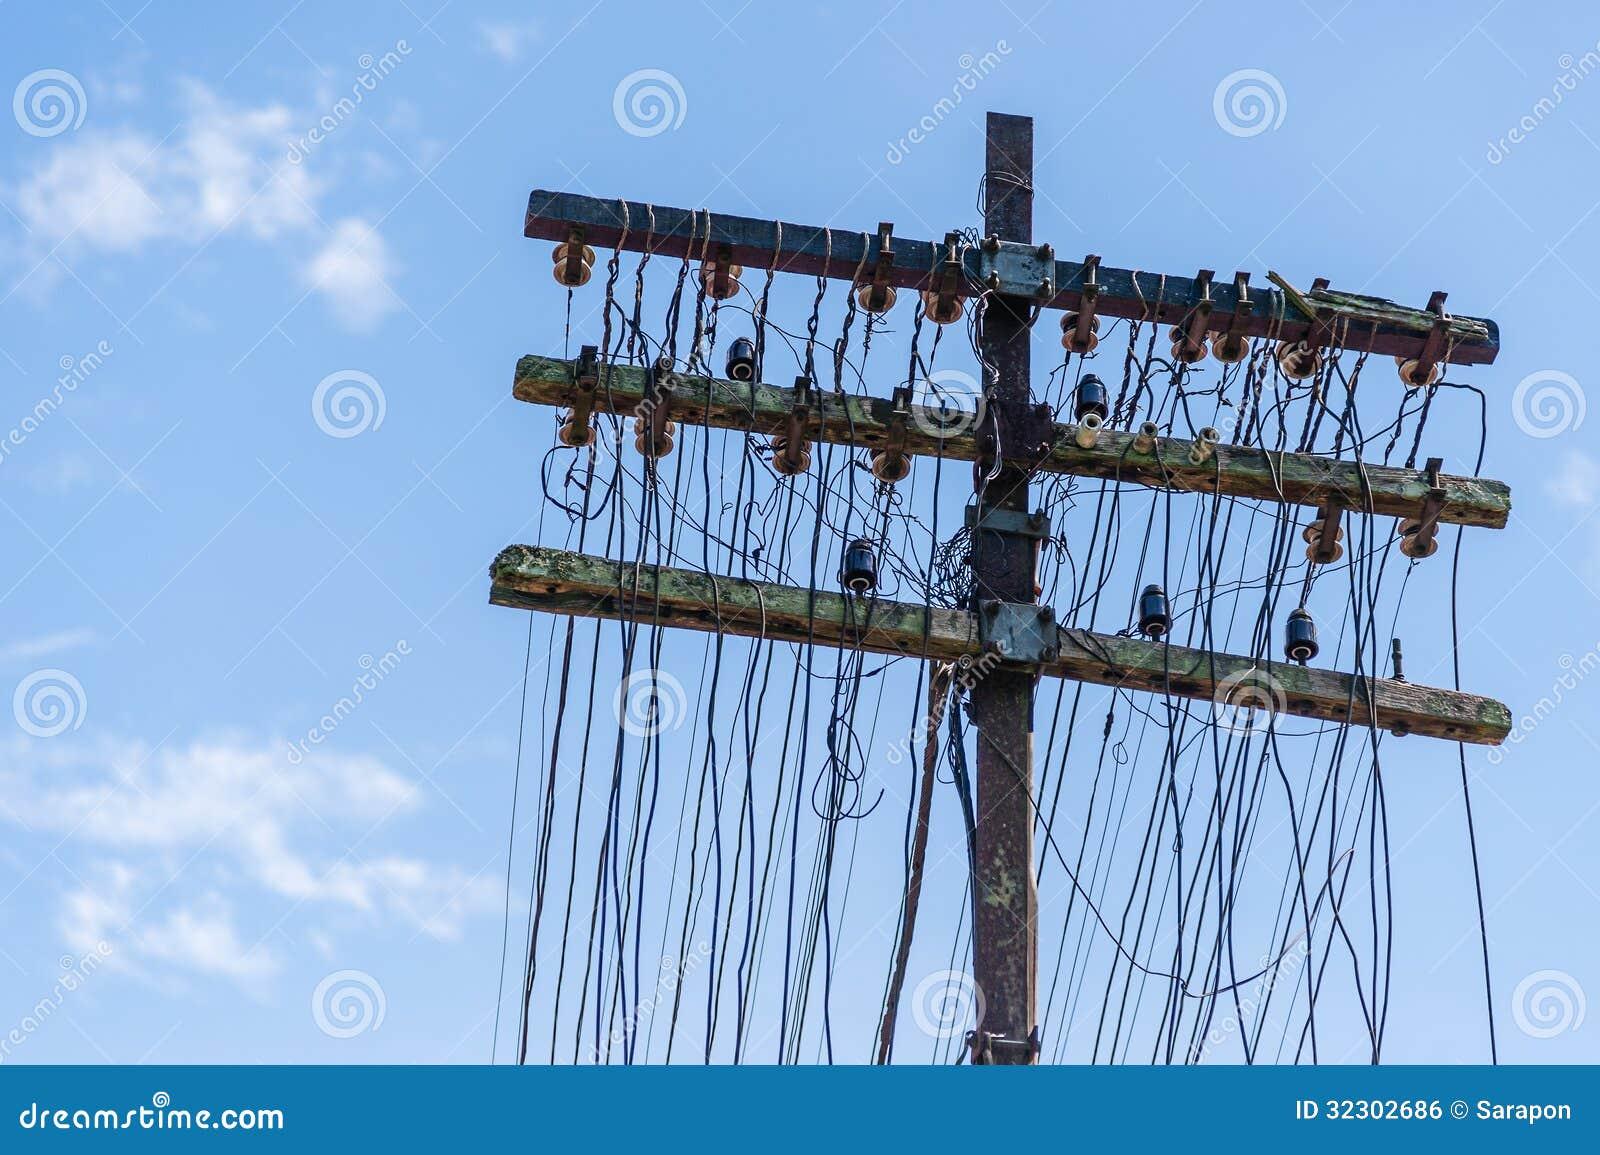 Antique telephone pole stock photo image of detailed for Glass telephone pole insulators